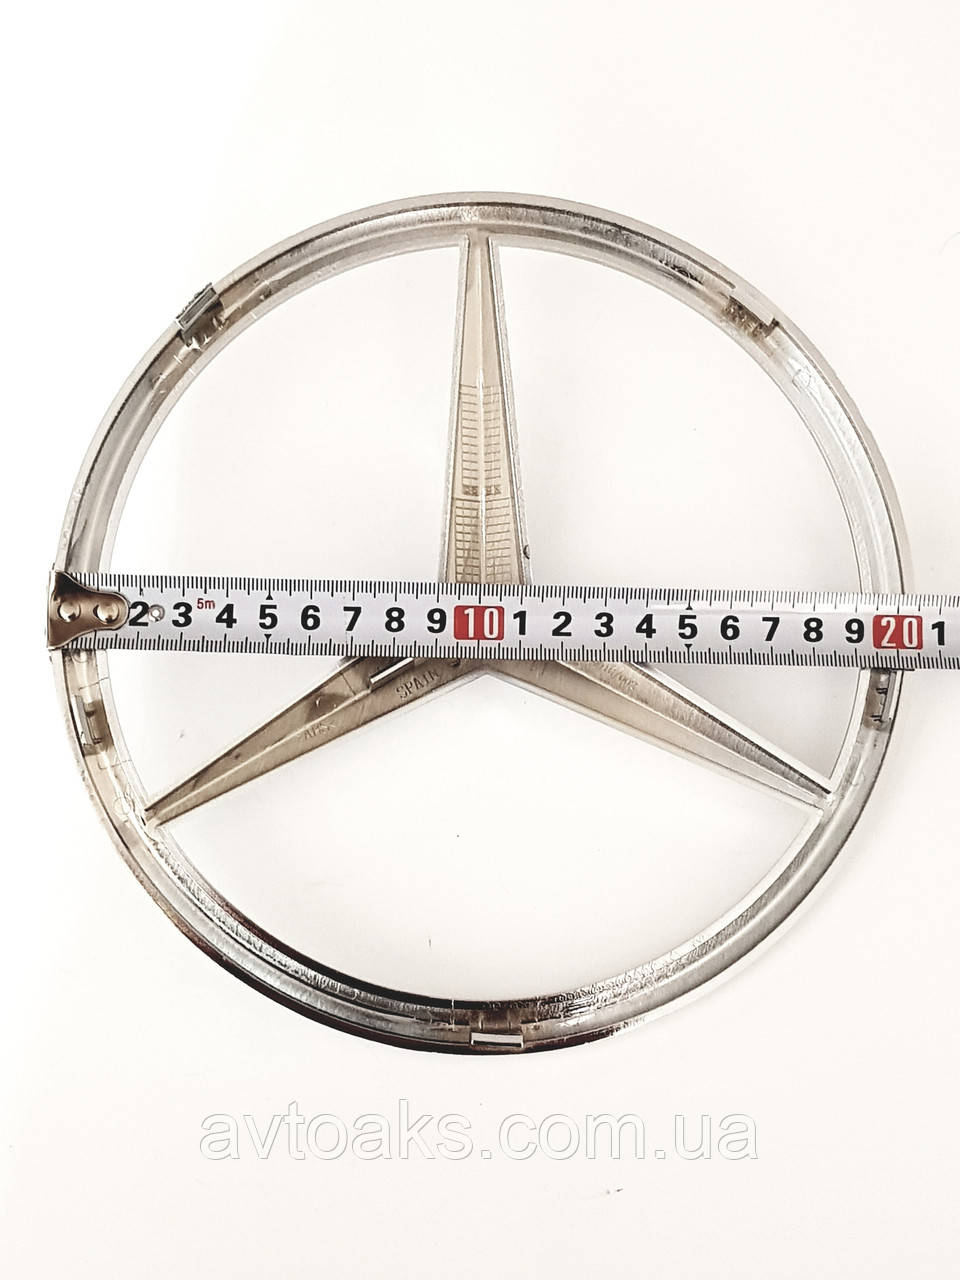 Эмблема Mercedes-Benz Sprinter перед. 200мм.